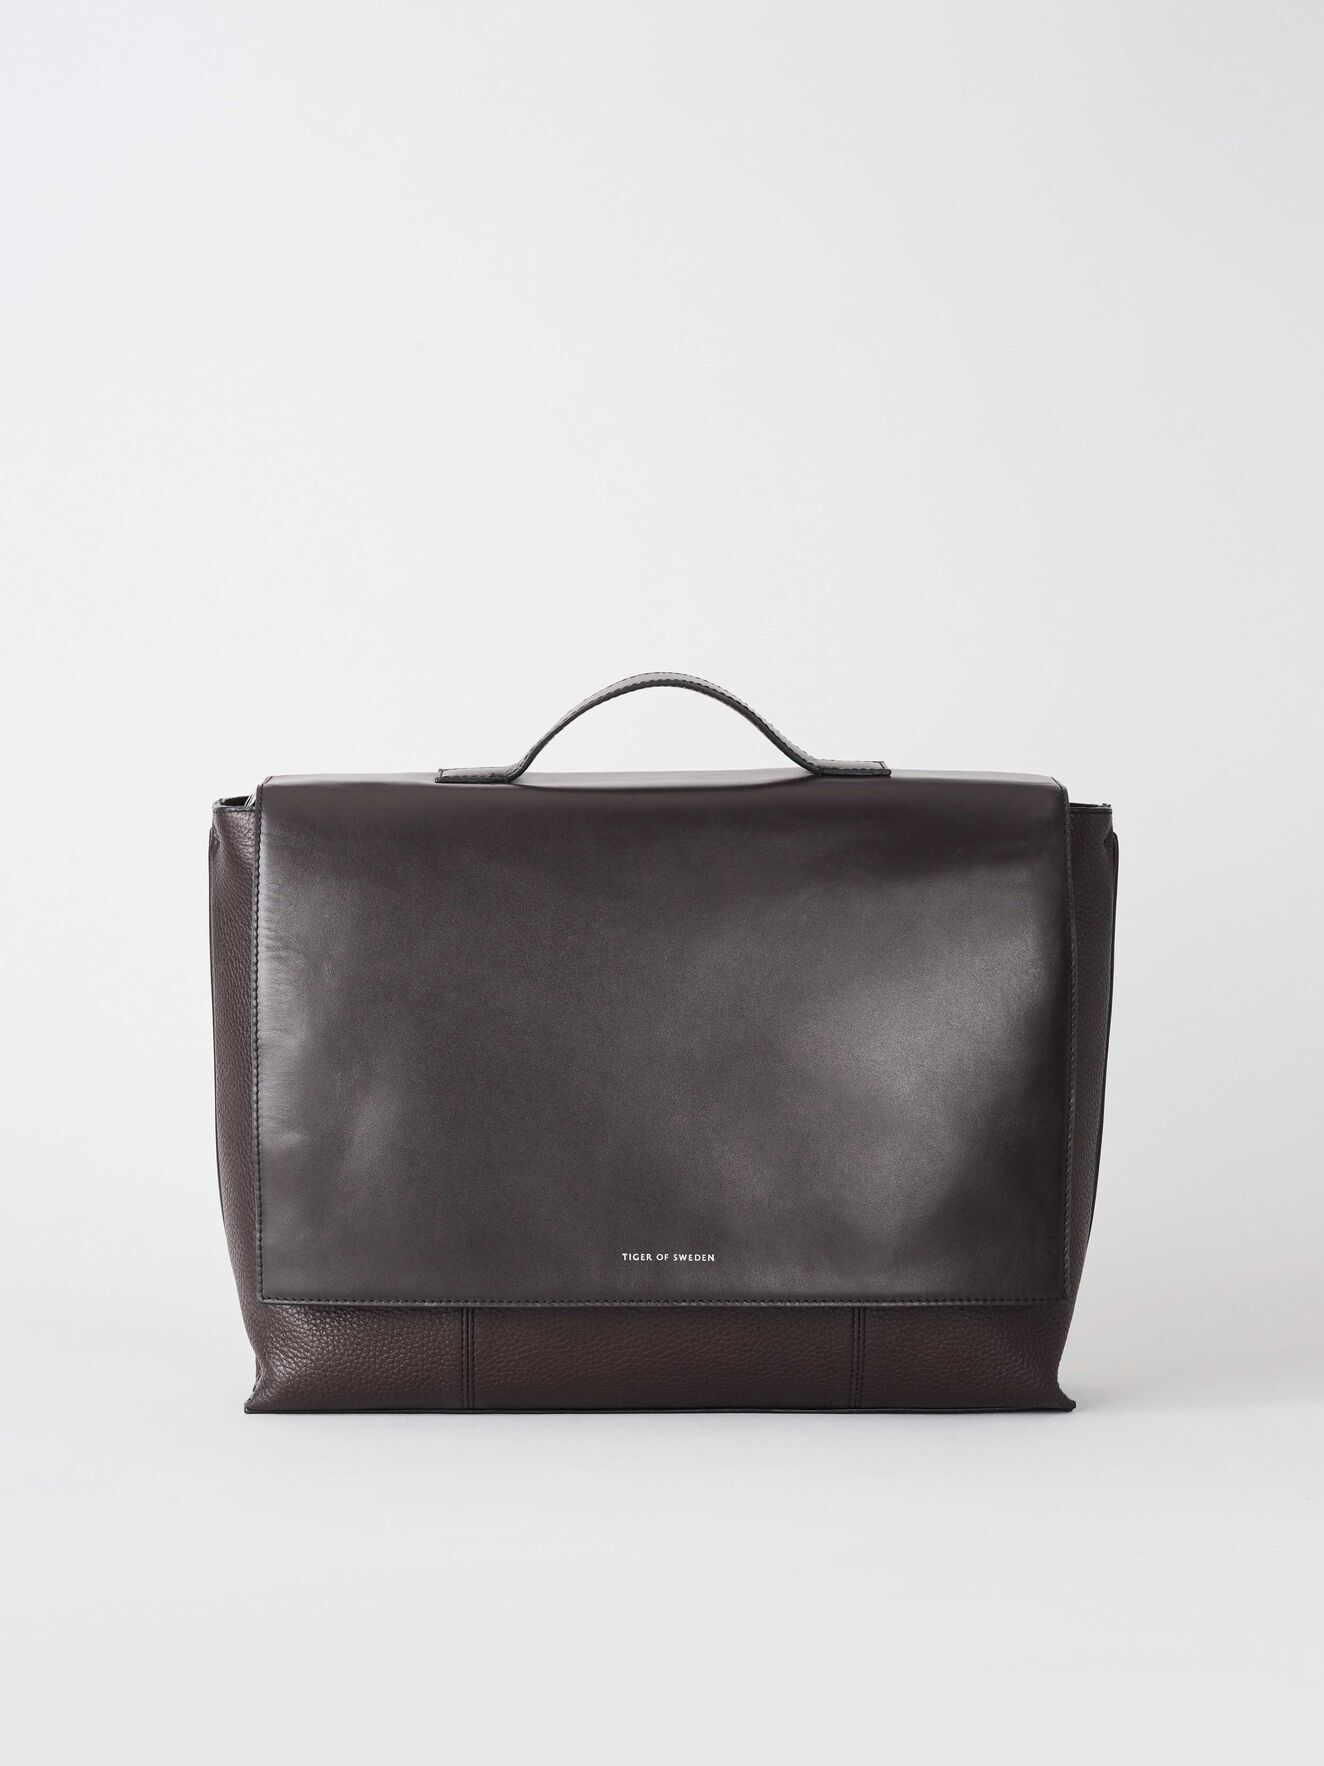 149d76ac Väskor - handla väskor online på Tiger of Sweden